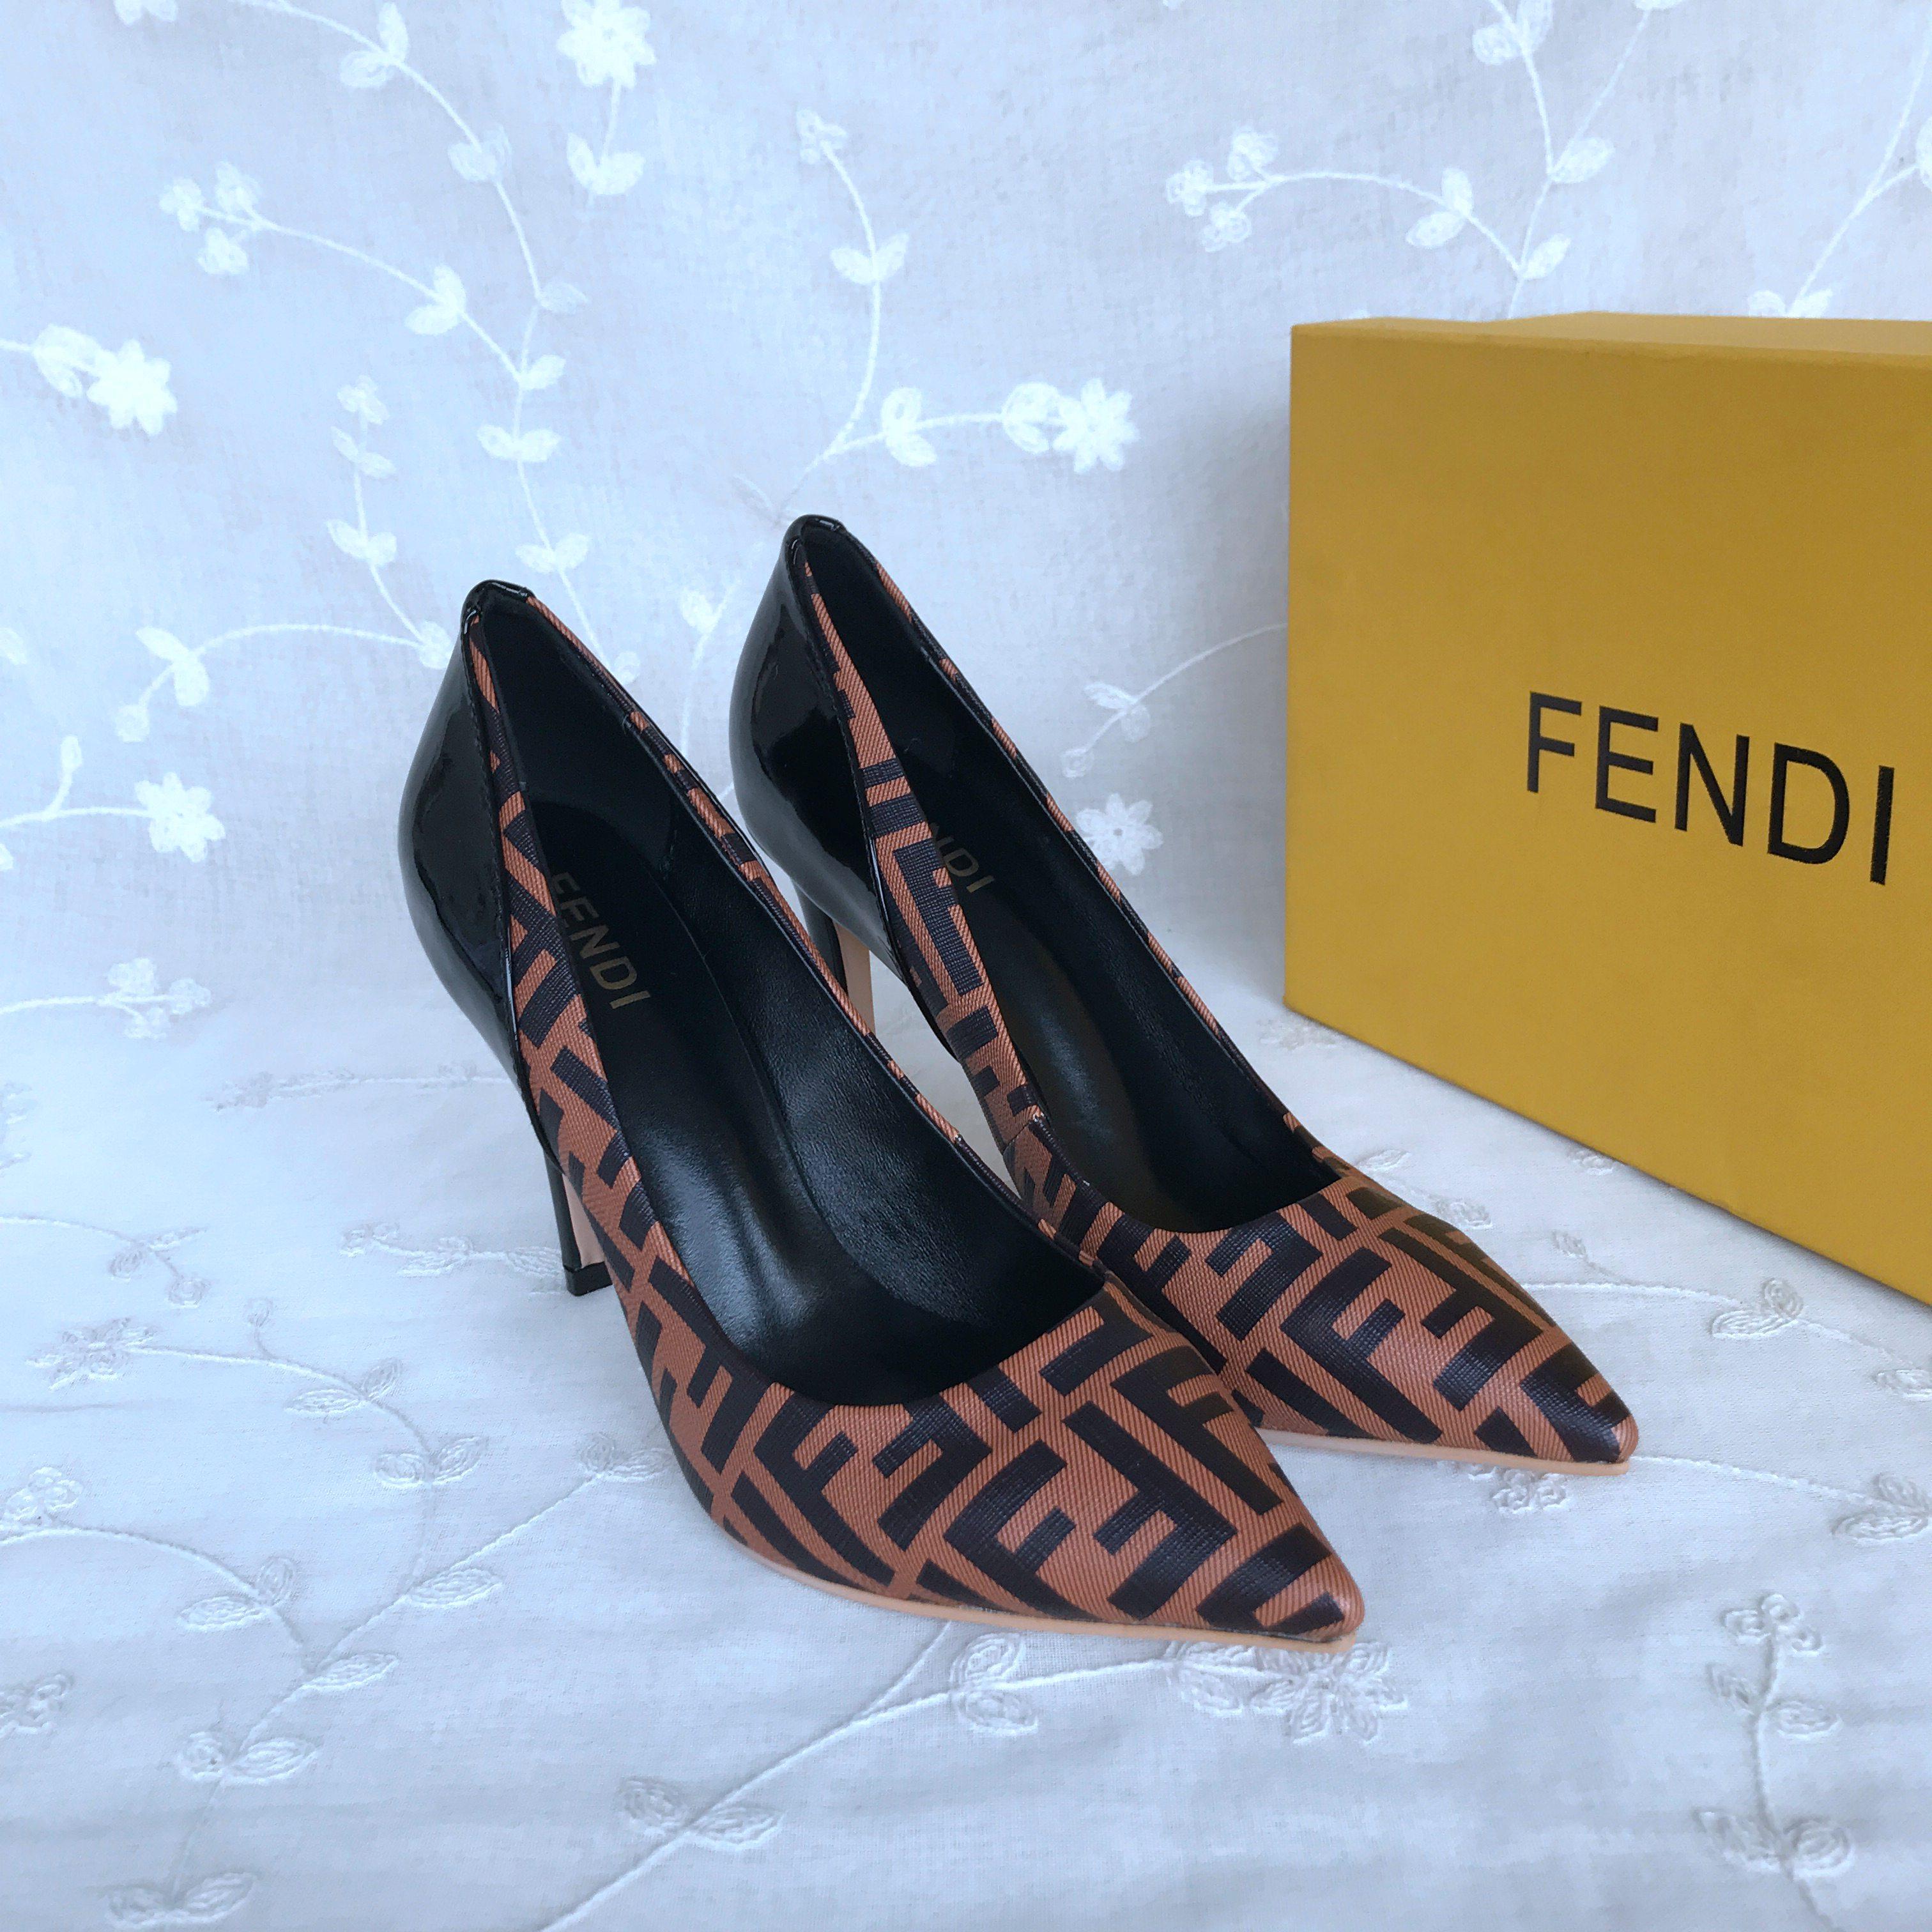 Fendi High heels 846647